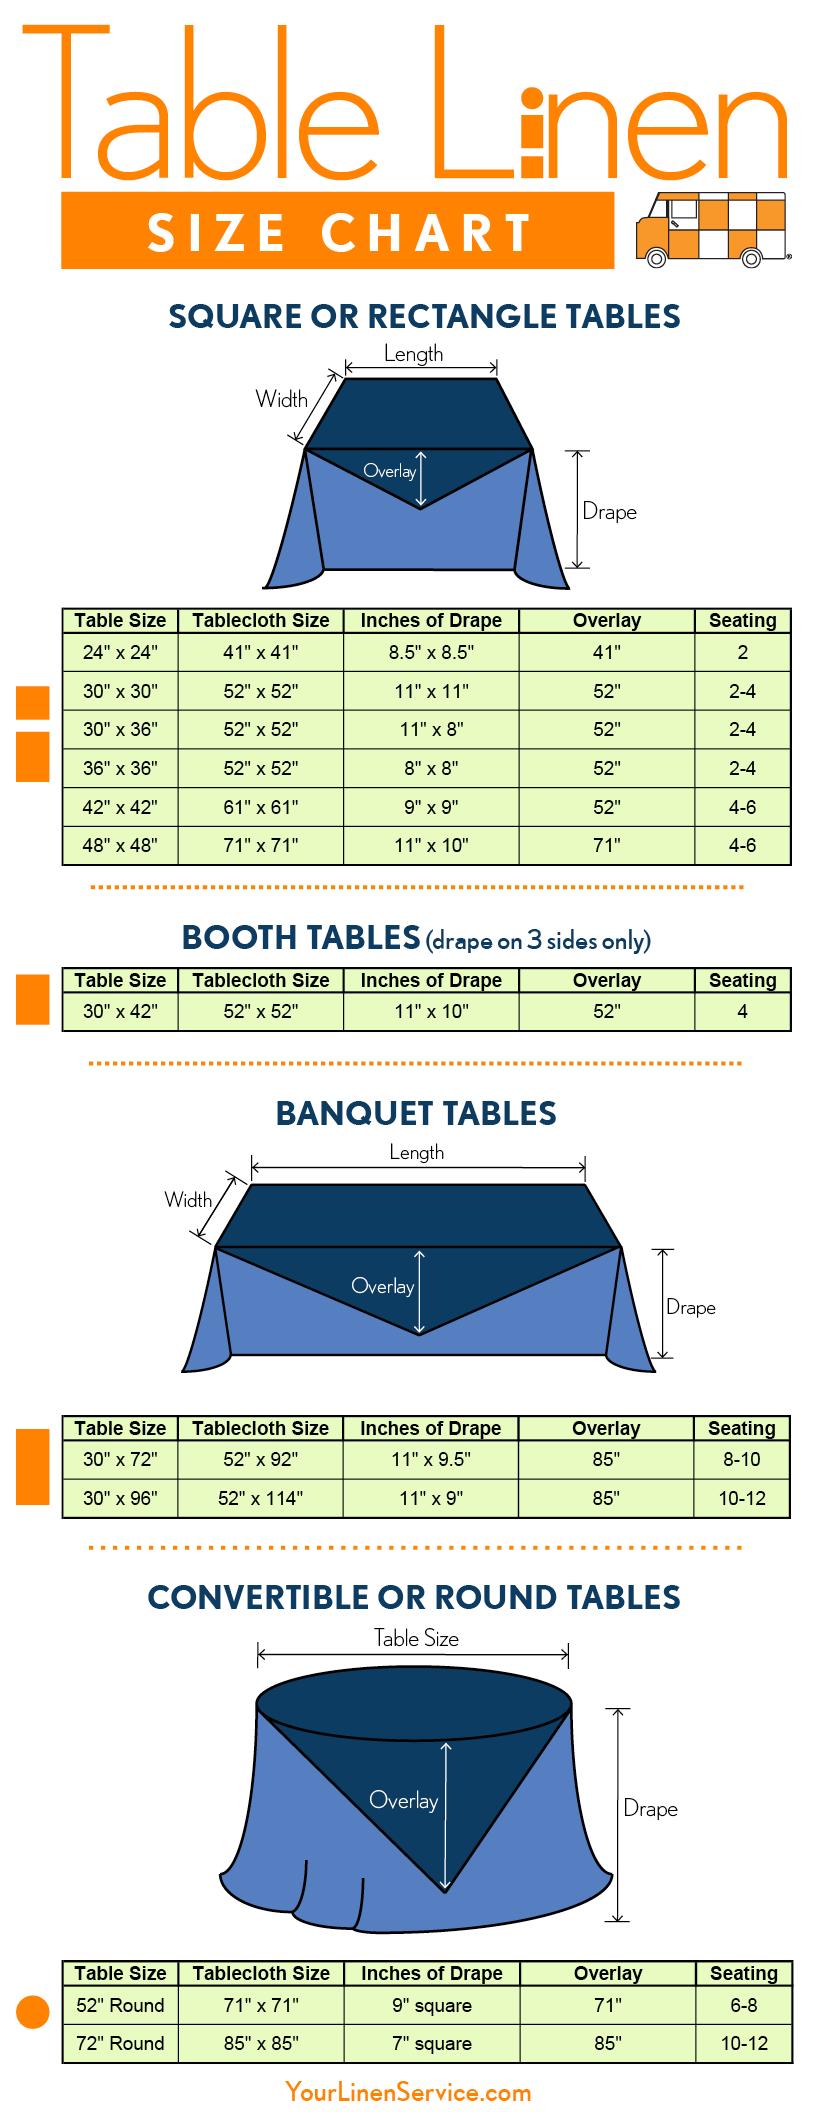 Sweetheart Table Linen Size | www.microfinanceindia.org